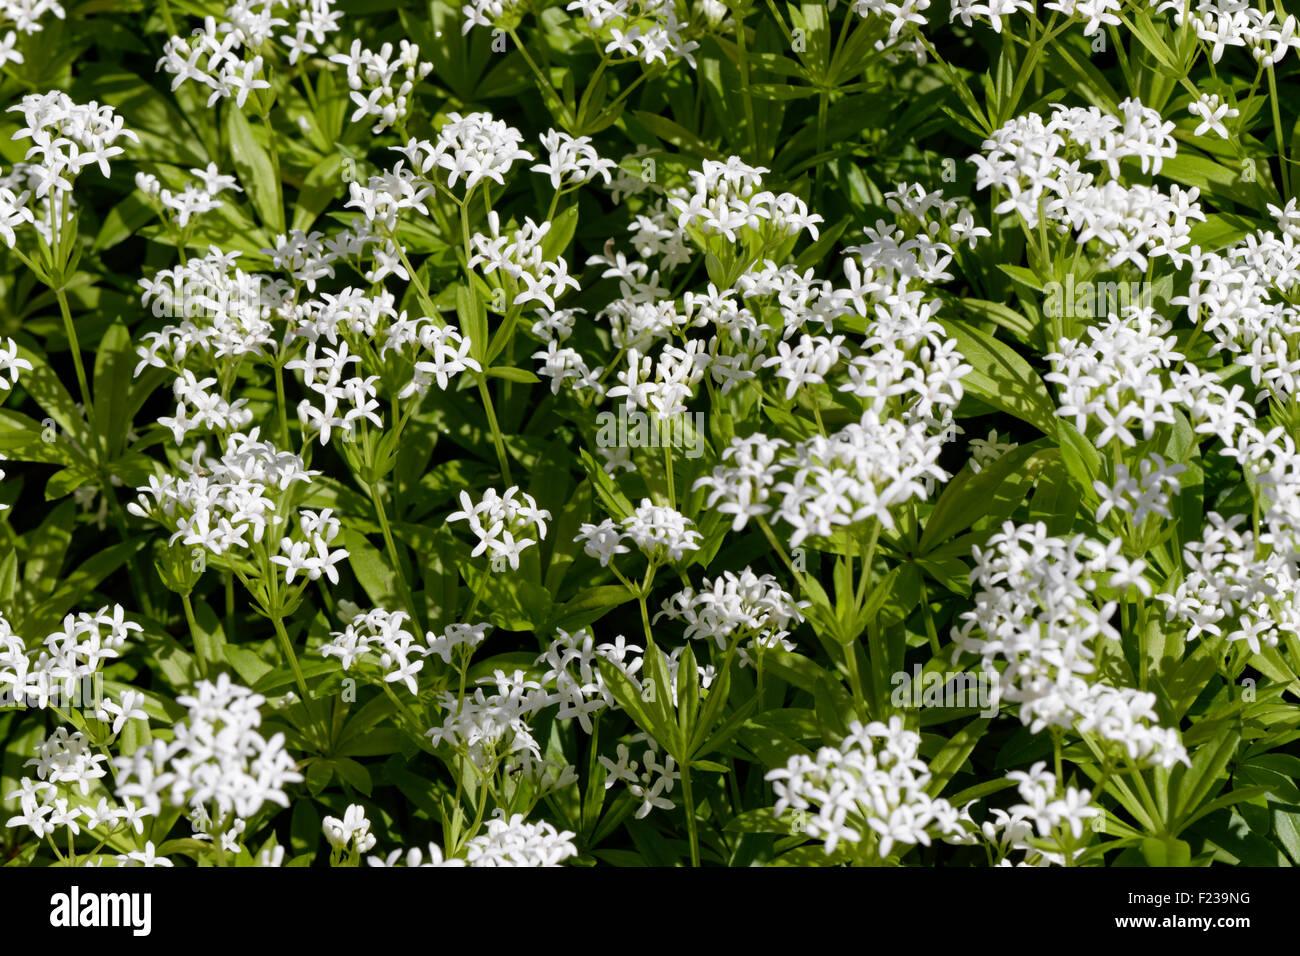 sweet woodruff galium odoratum stock photo royalty free. Black Bedroom Furniture Sets. Home Design Ideas